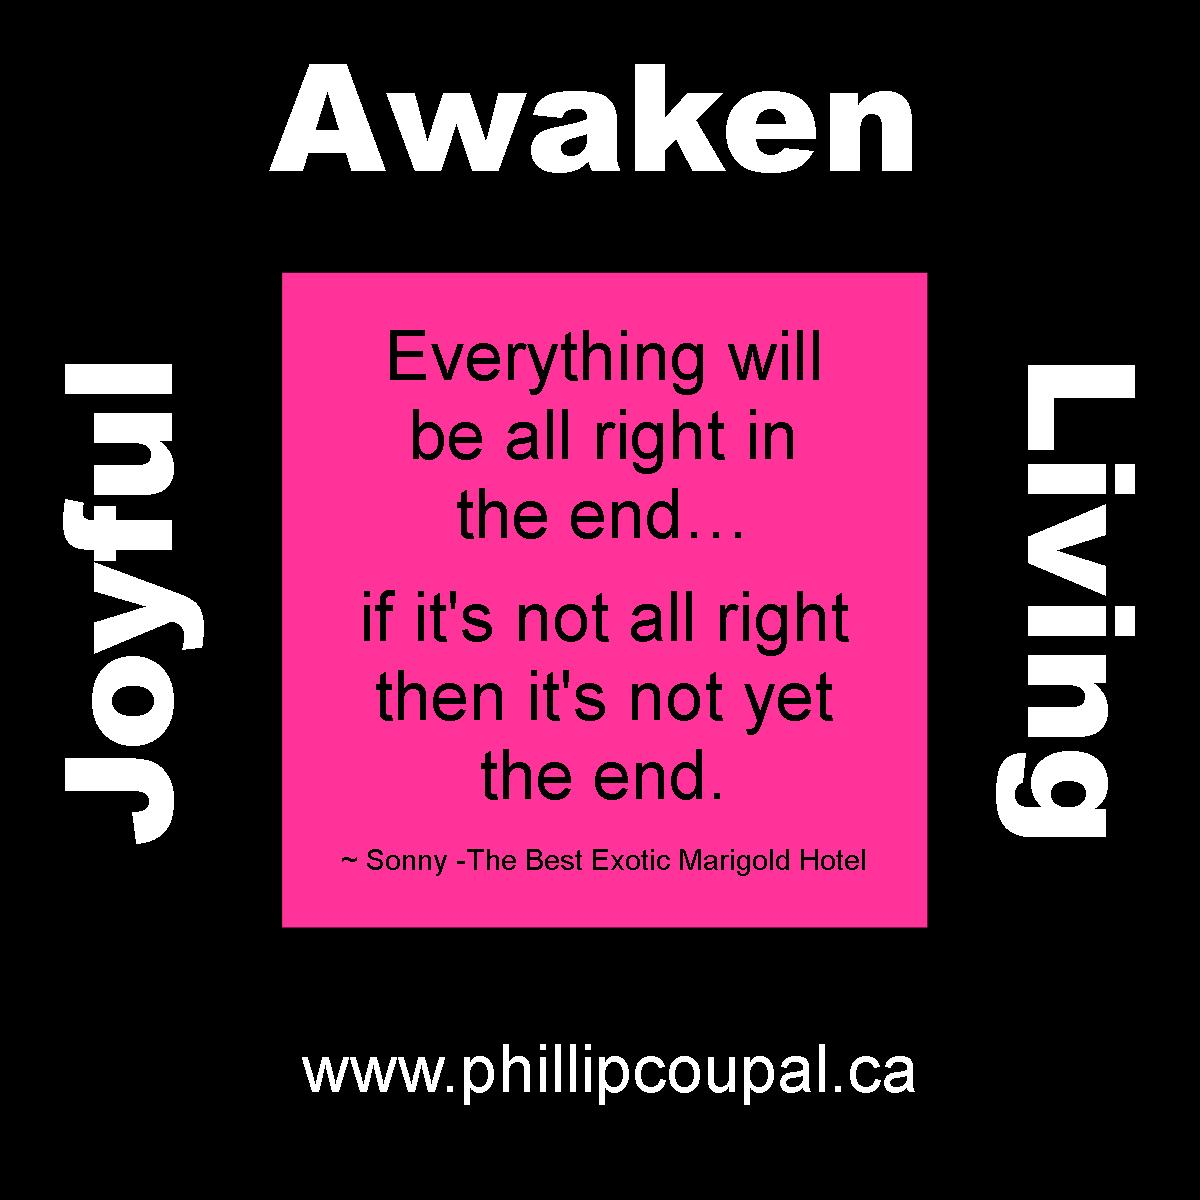 Awaken Joyful Living www.phillipcoupal.ca